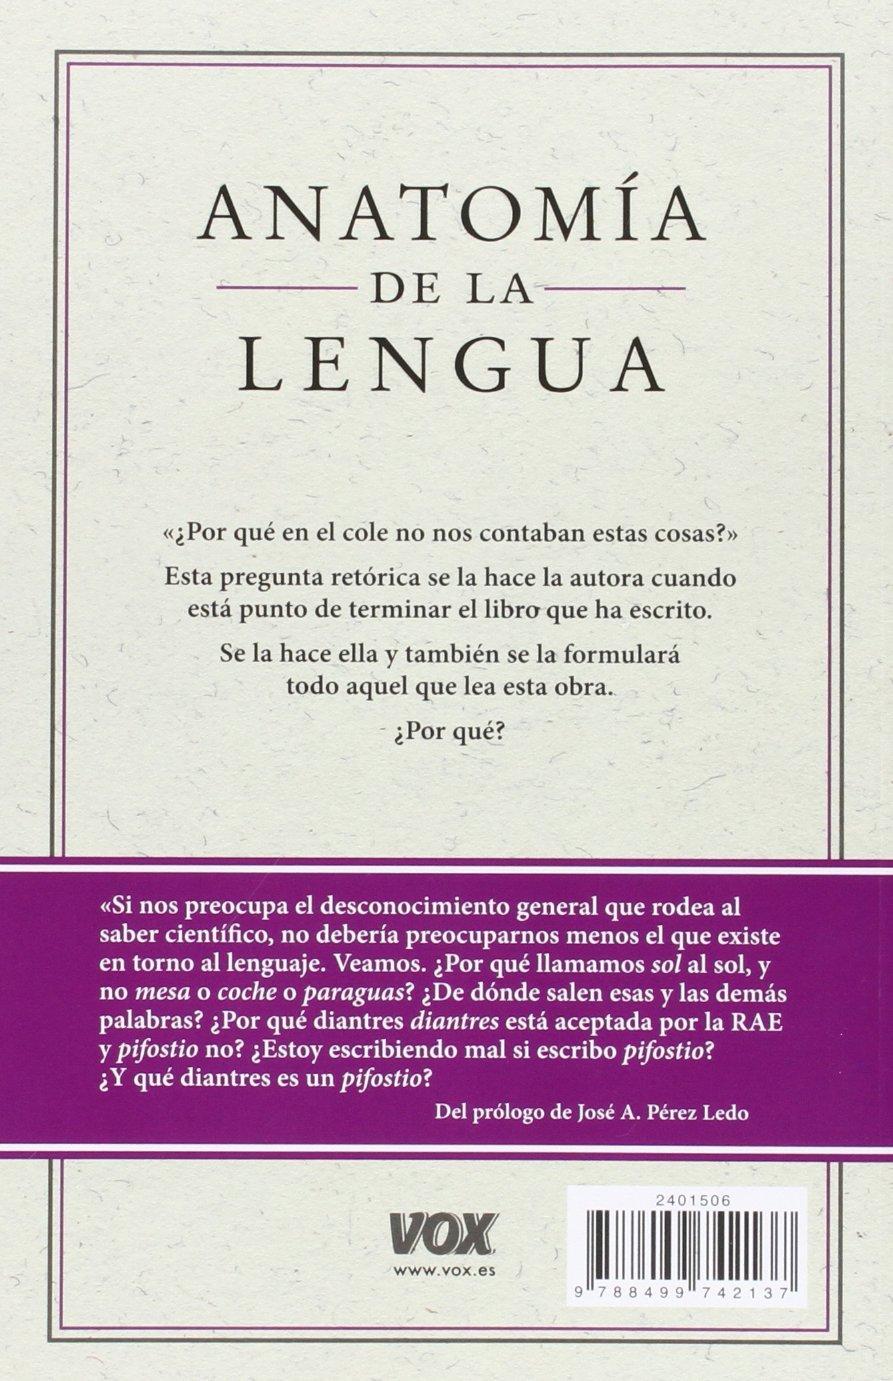 Anatom�a de la lengua: Elena;Basterrechea Molina, Eduardo Álvarez Mellado: 9788499742137: Amazon.com: Books